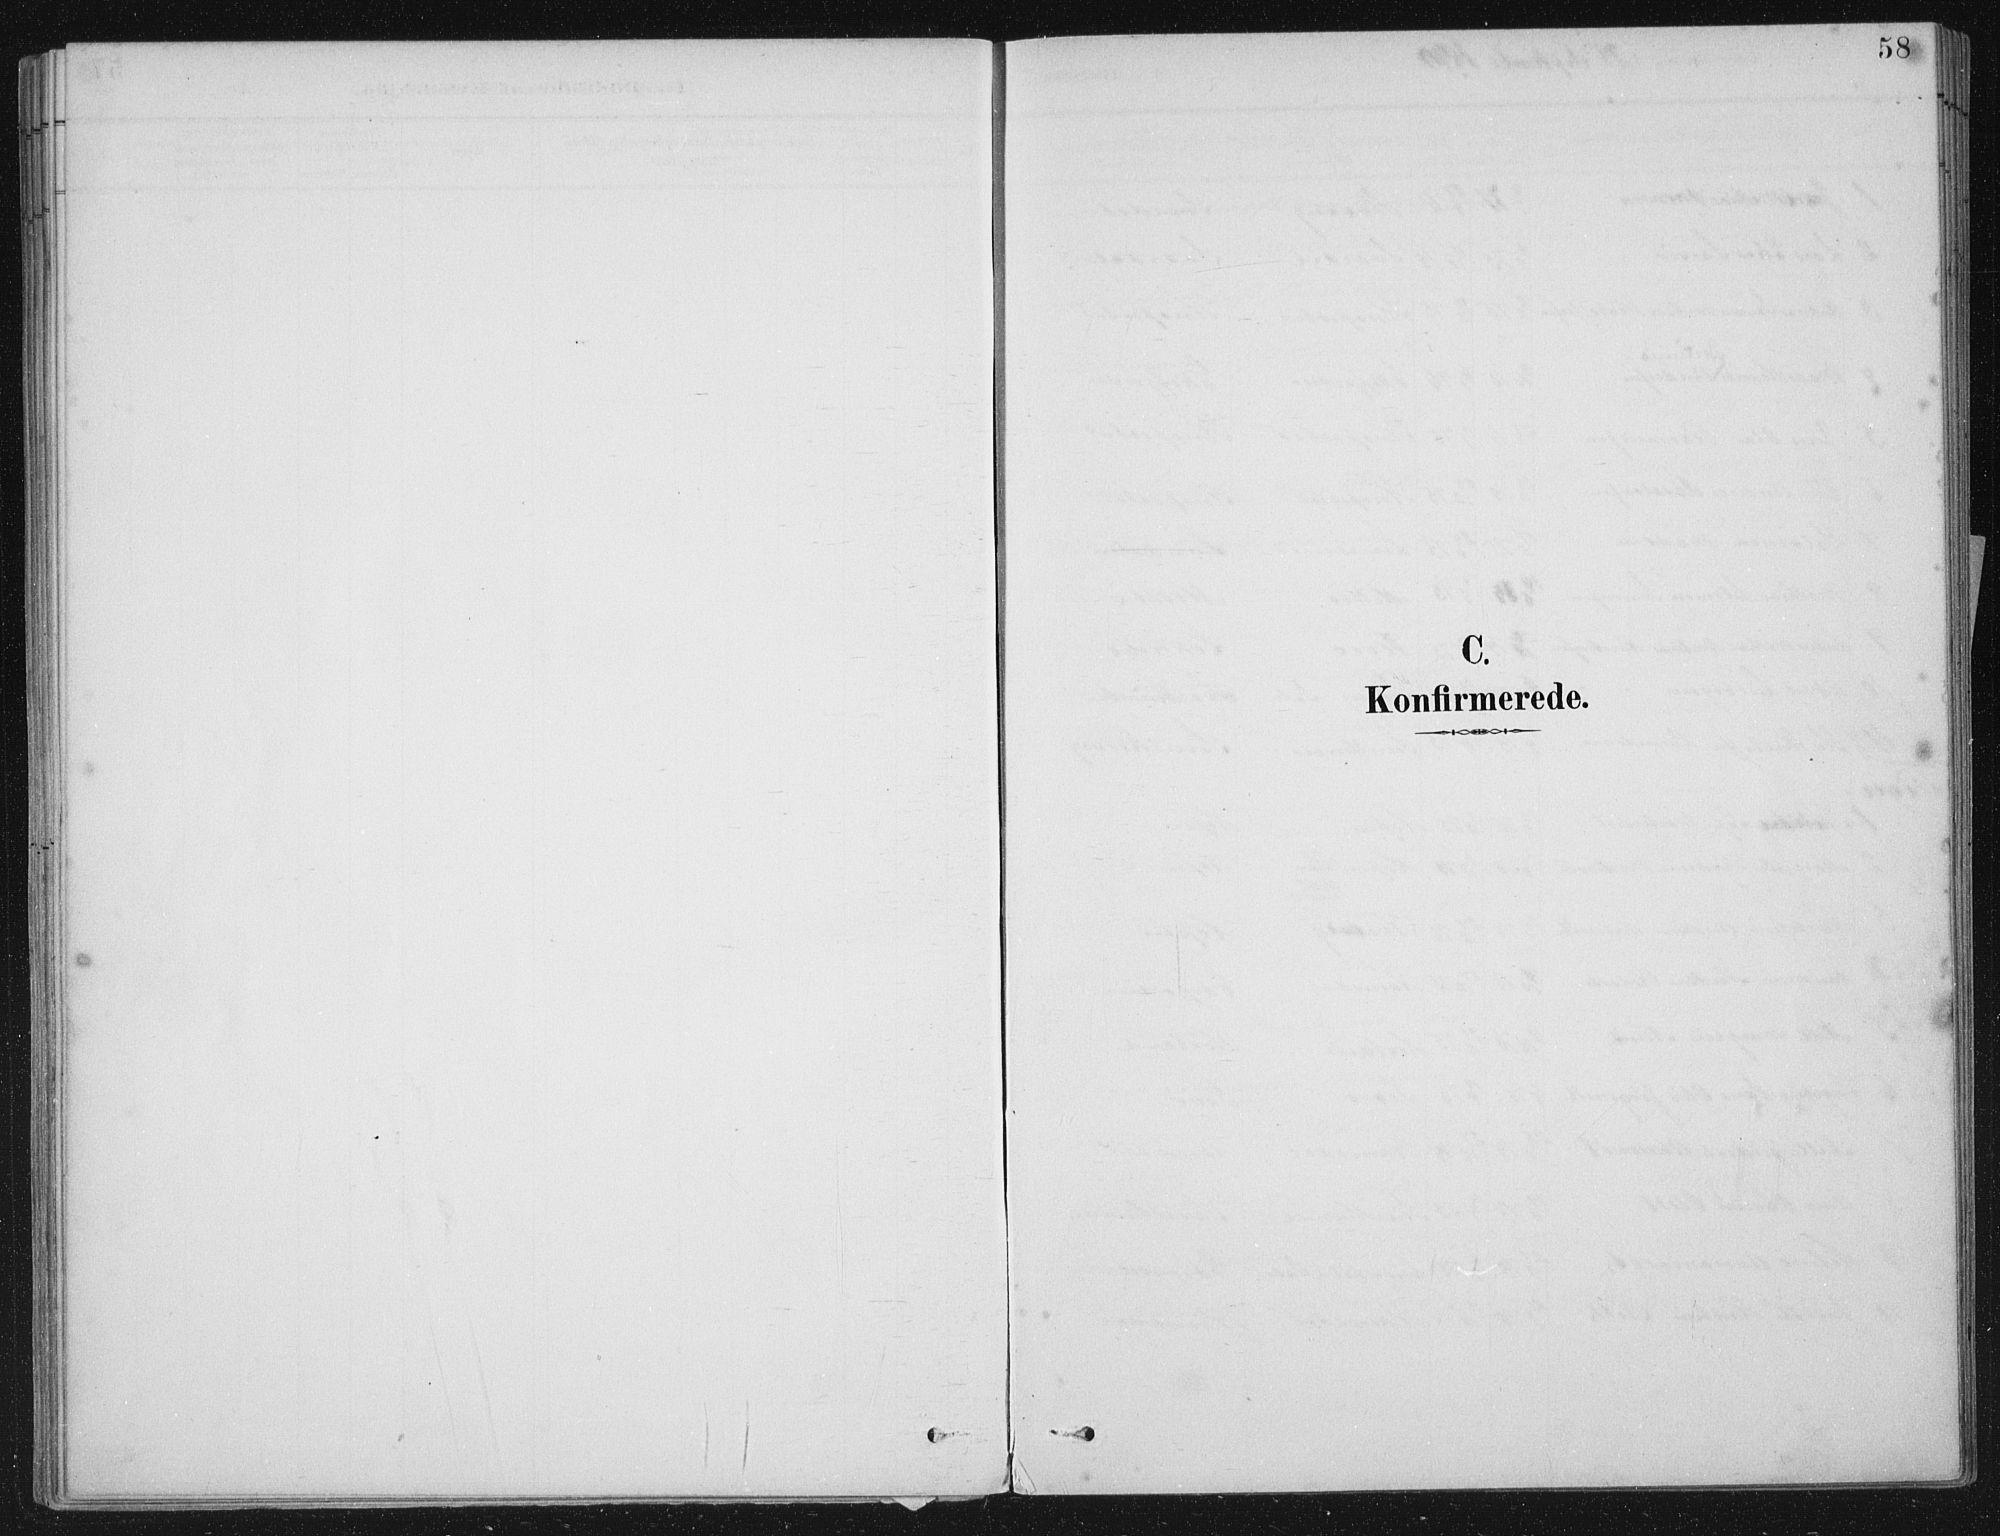 SAB, Kinn sokneprestembete, H/Haa/Haae/L0001: Ministerialbok nr. E 1, 1890-1916, s. 58